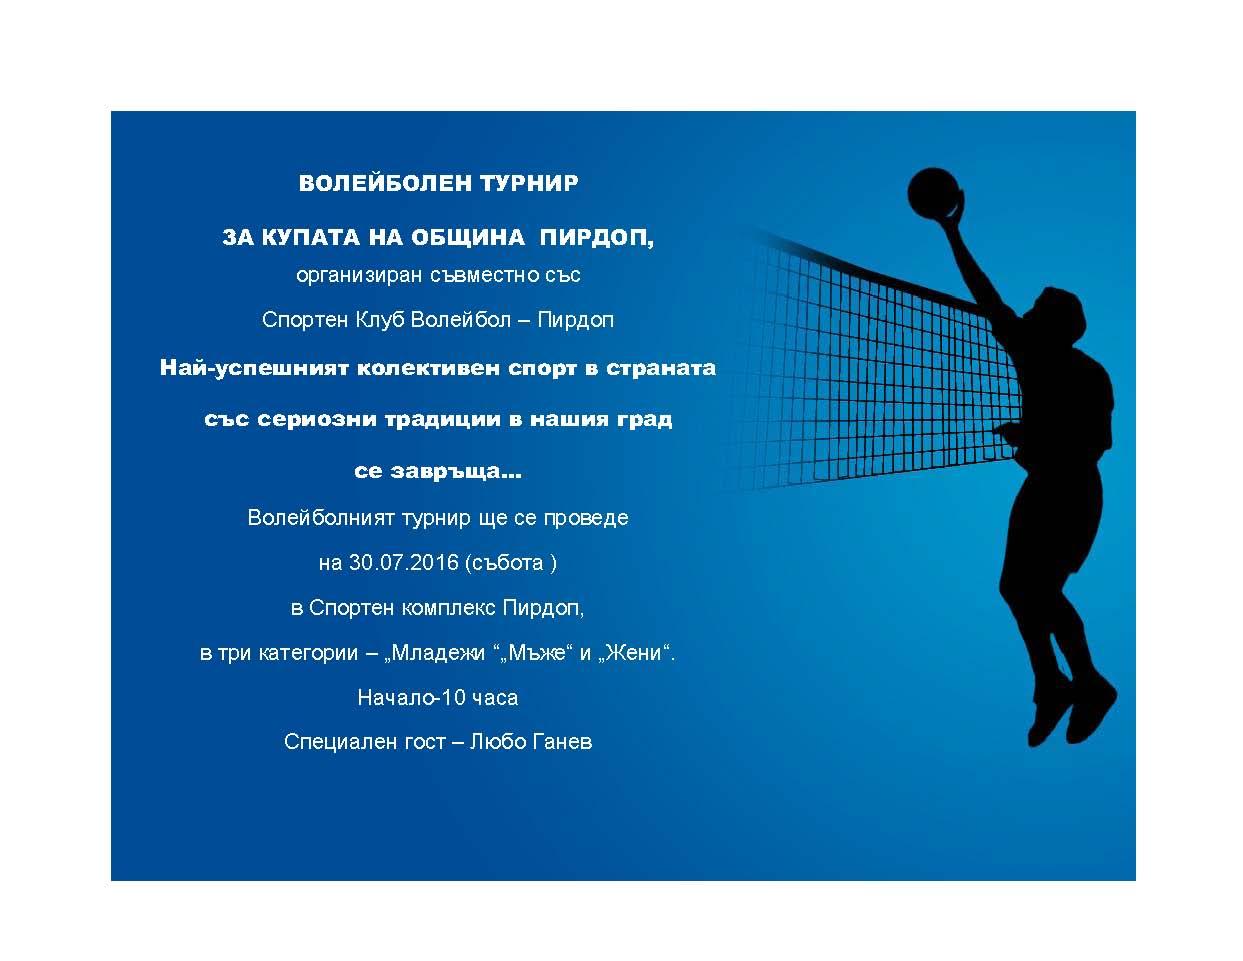 Poster_Kupa Pirdop_Tournament